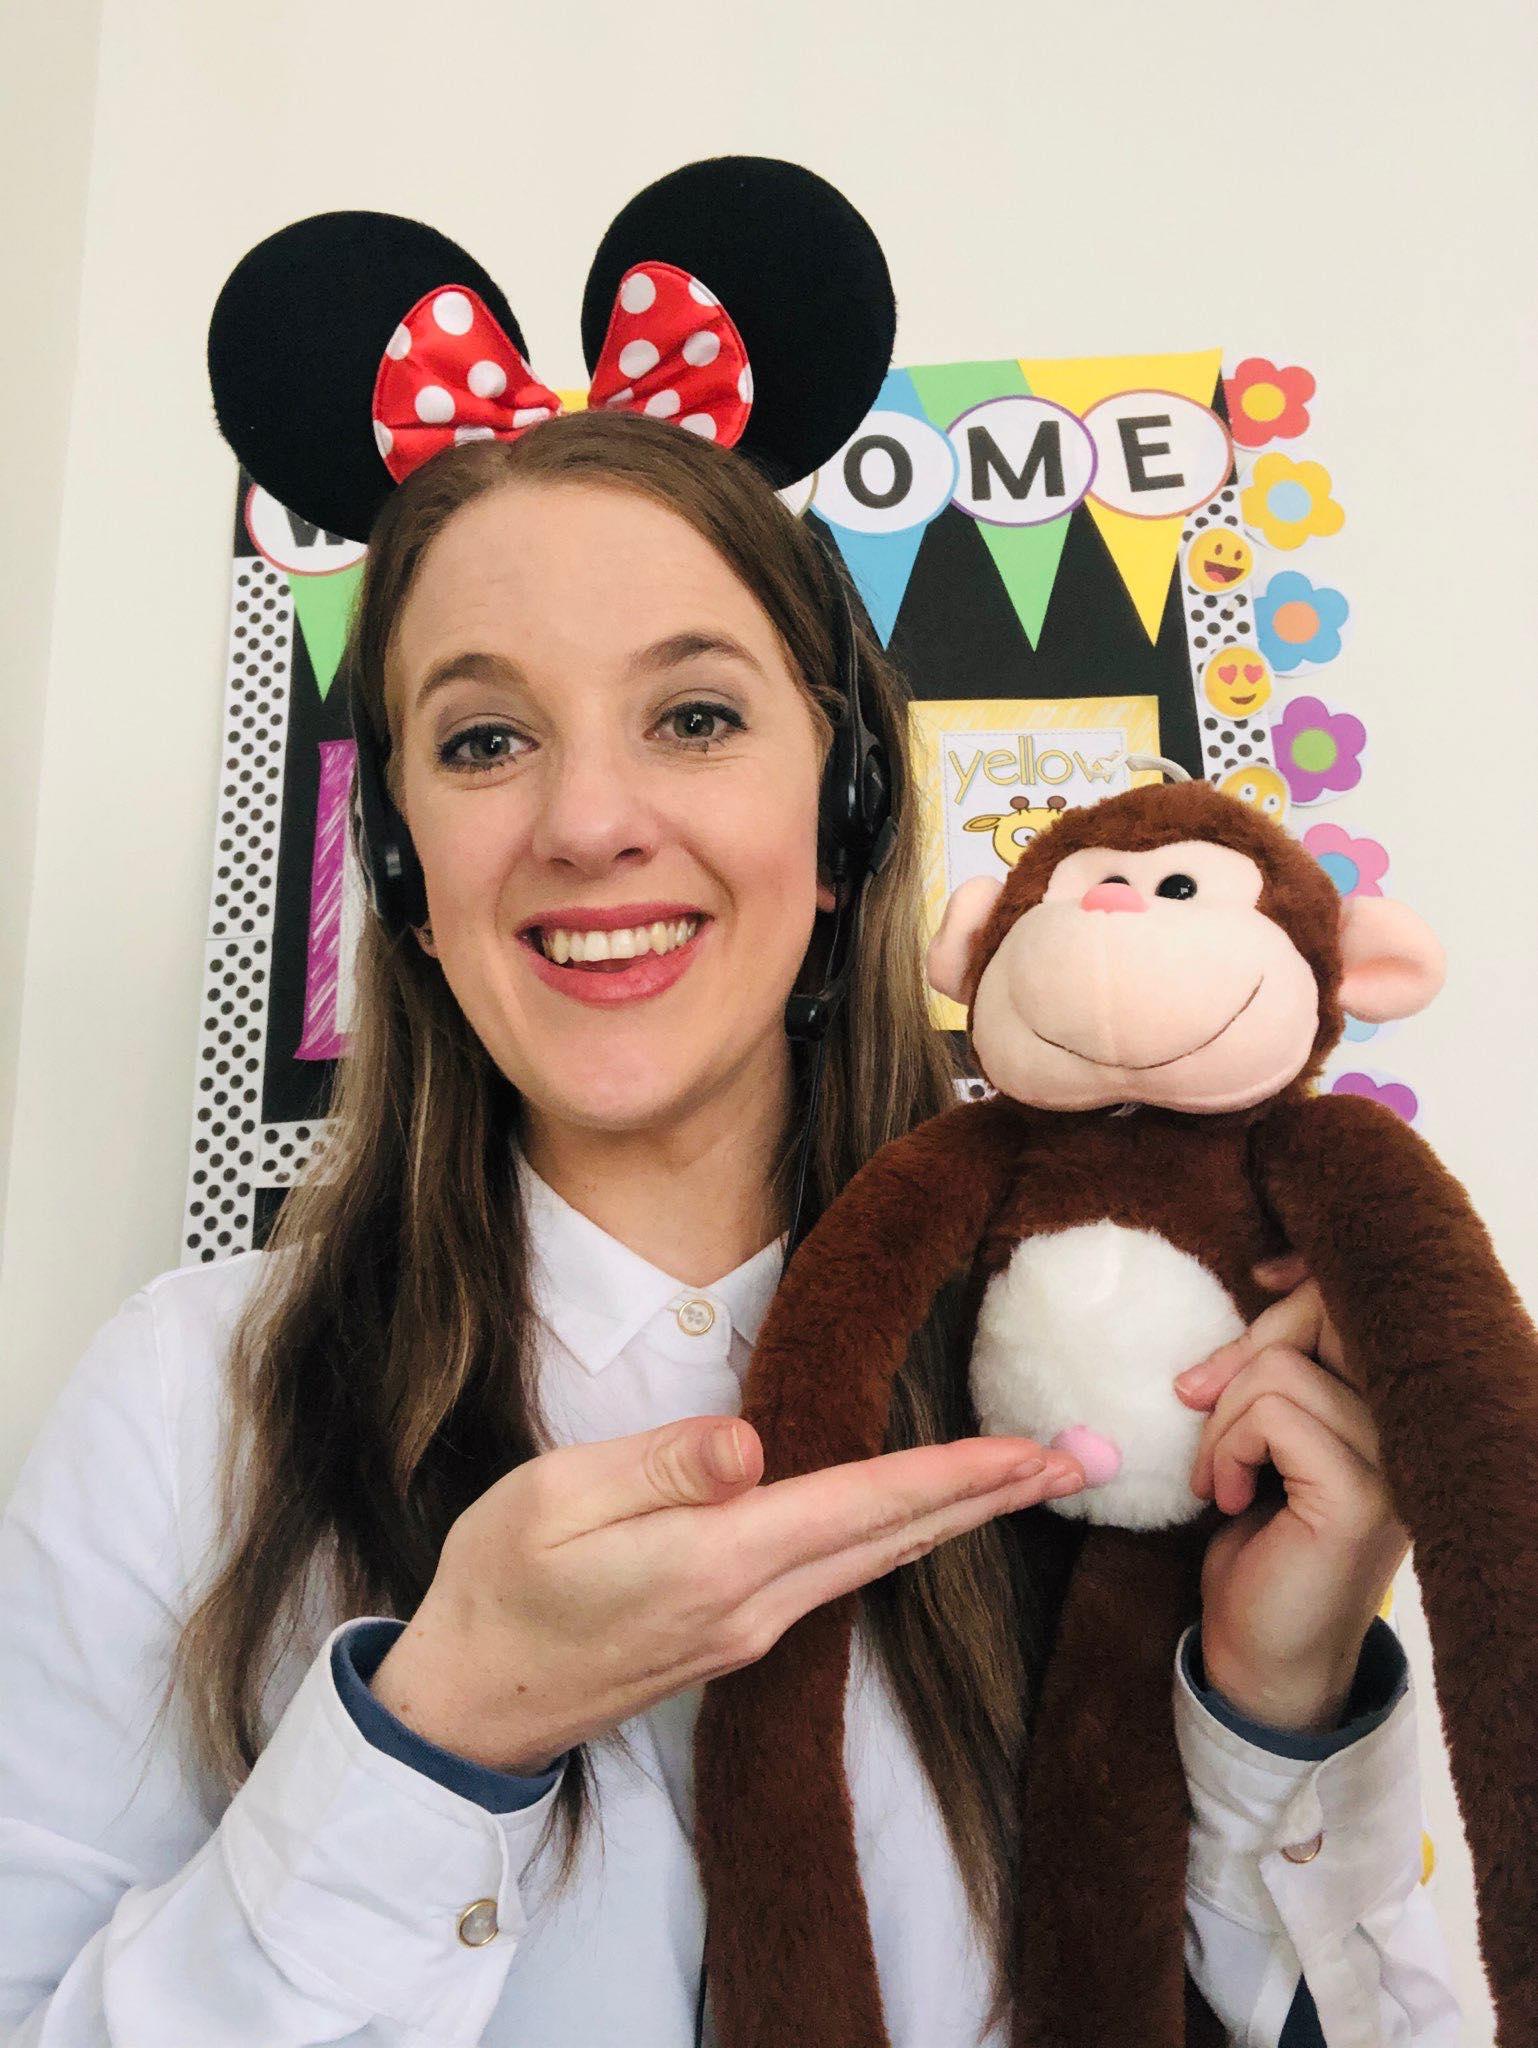 Online English Teacher Melissa with prop